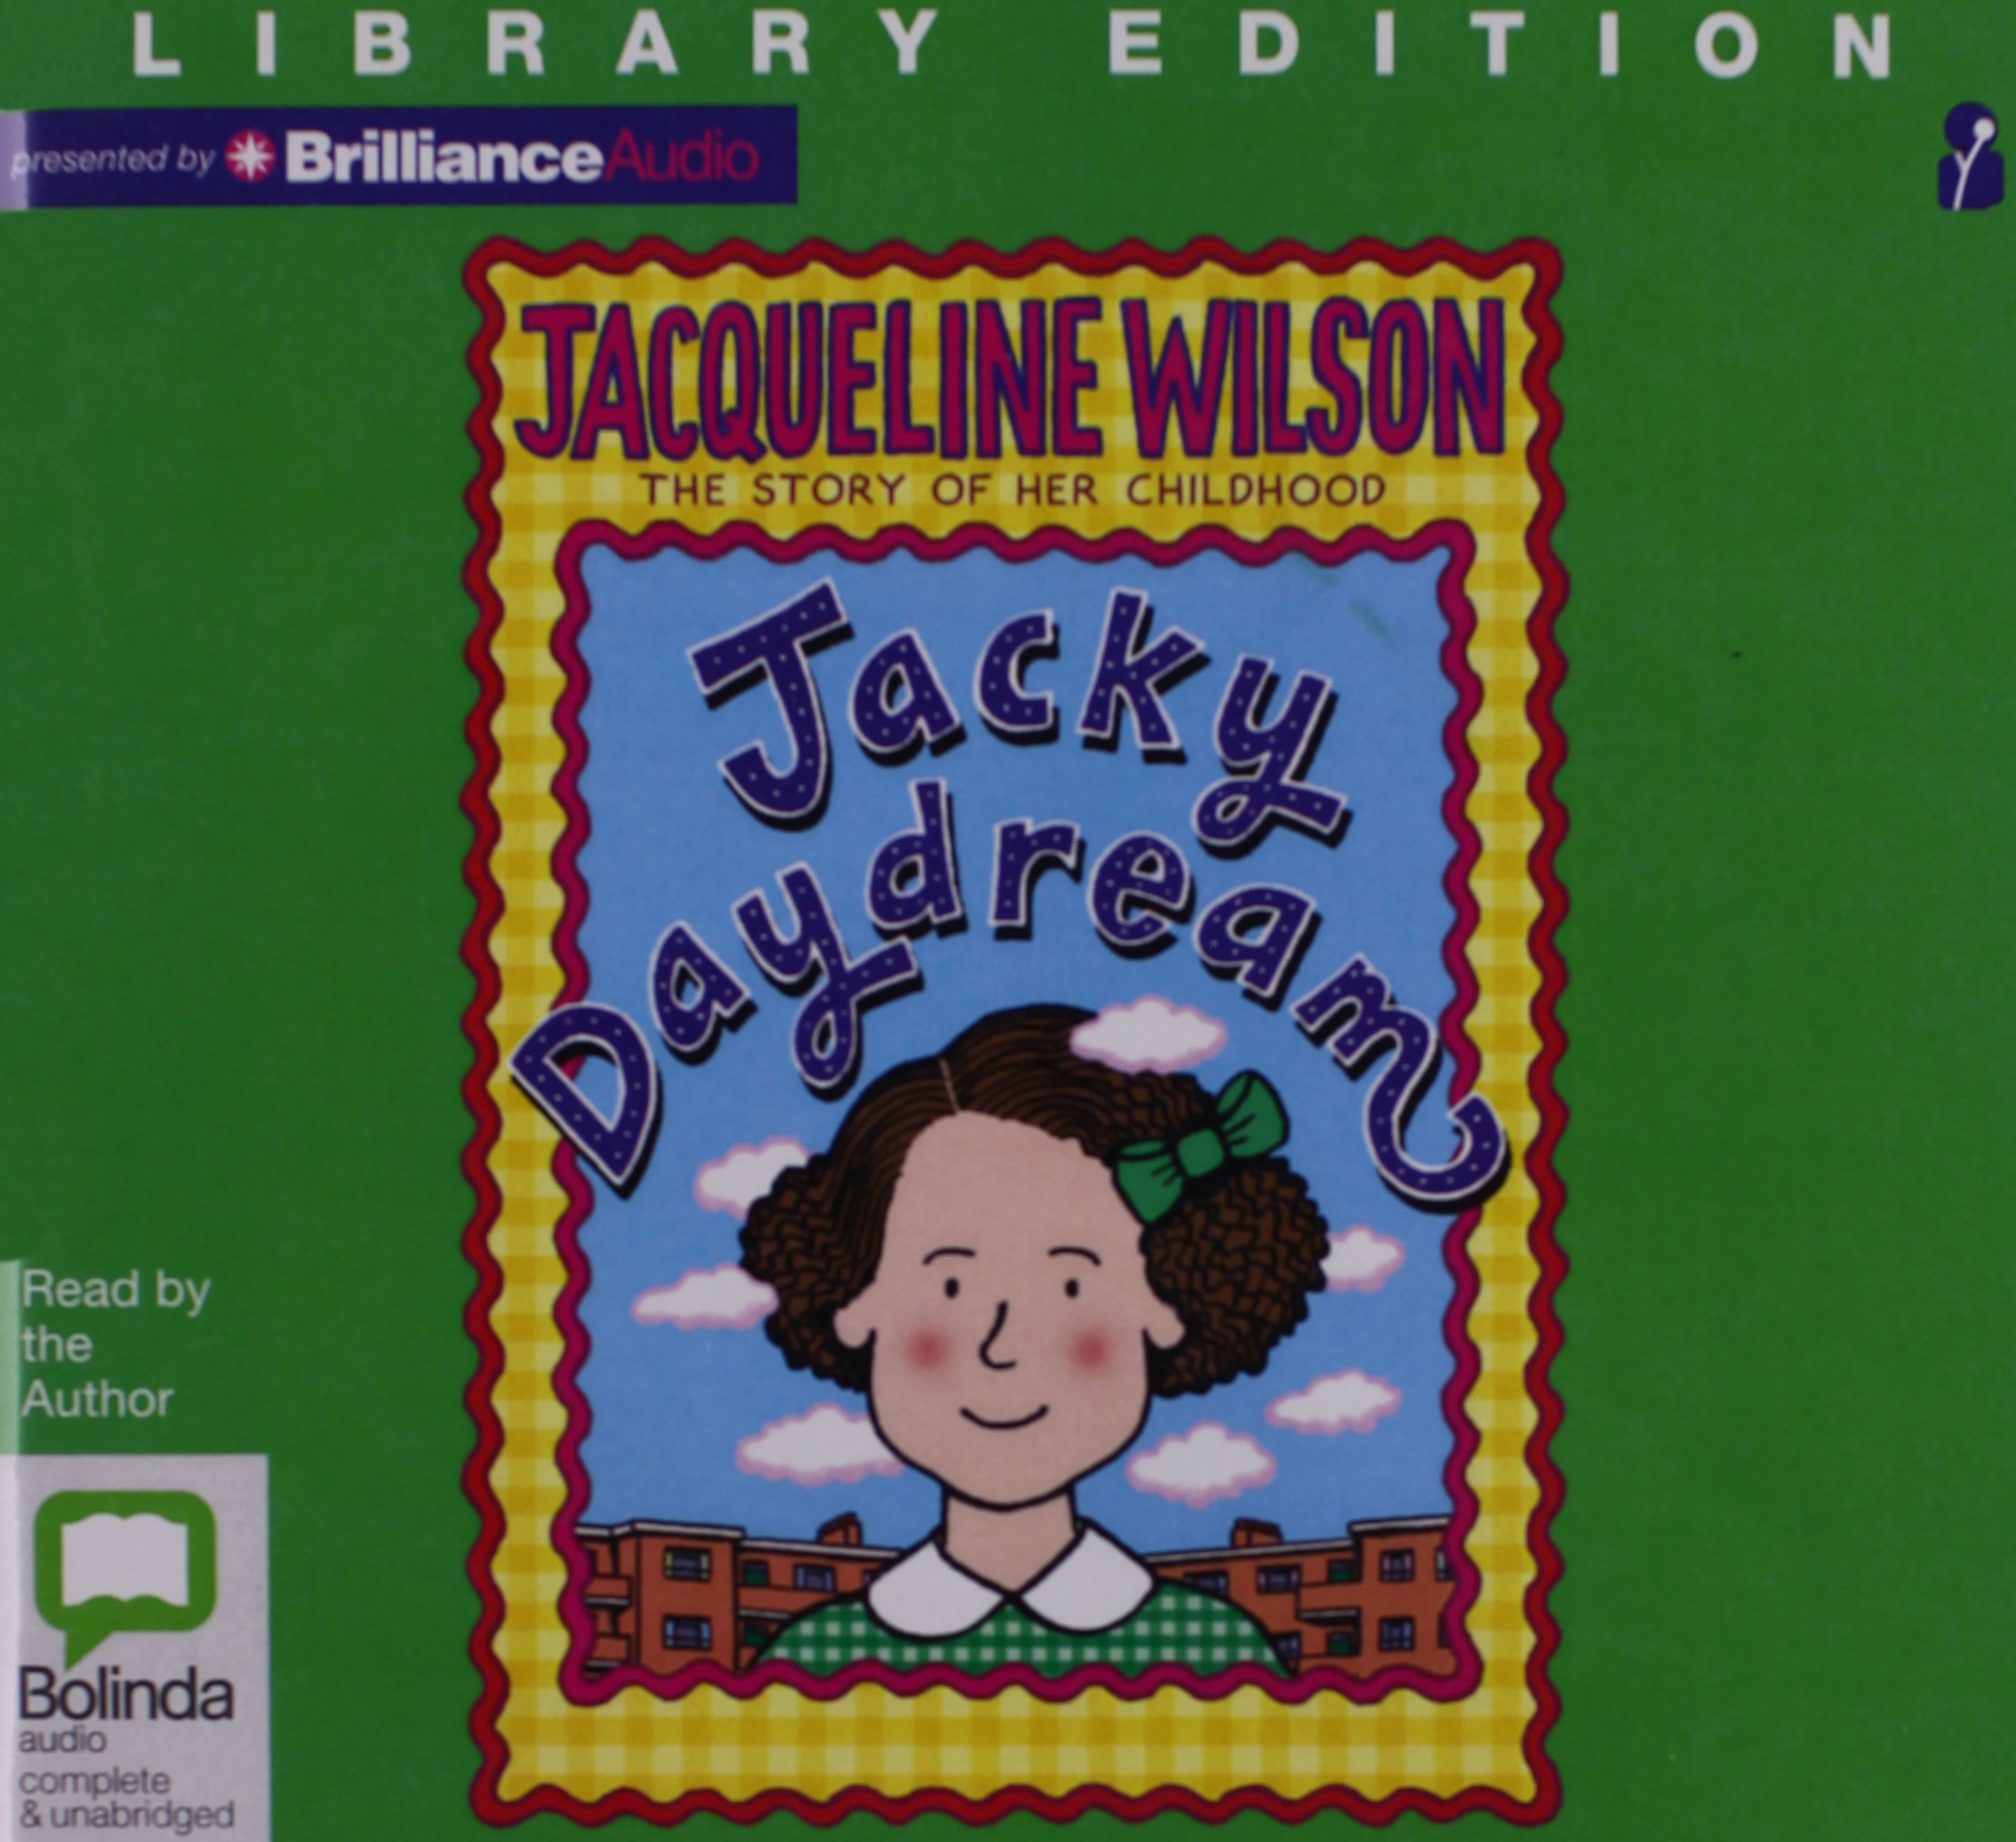 Jacky Daydream by Bolinda Audio